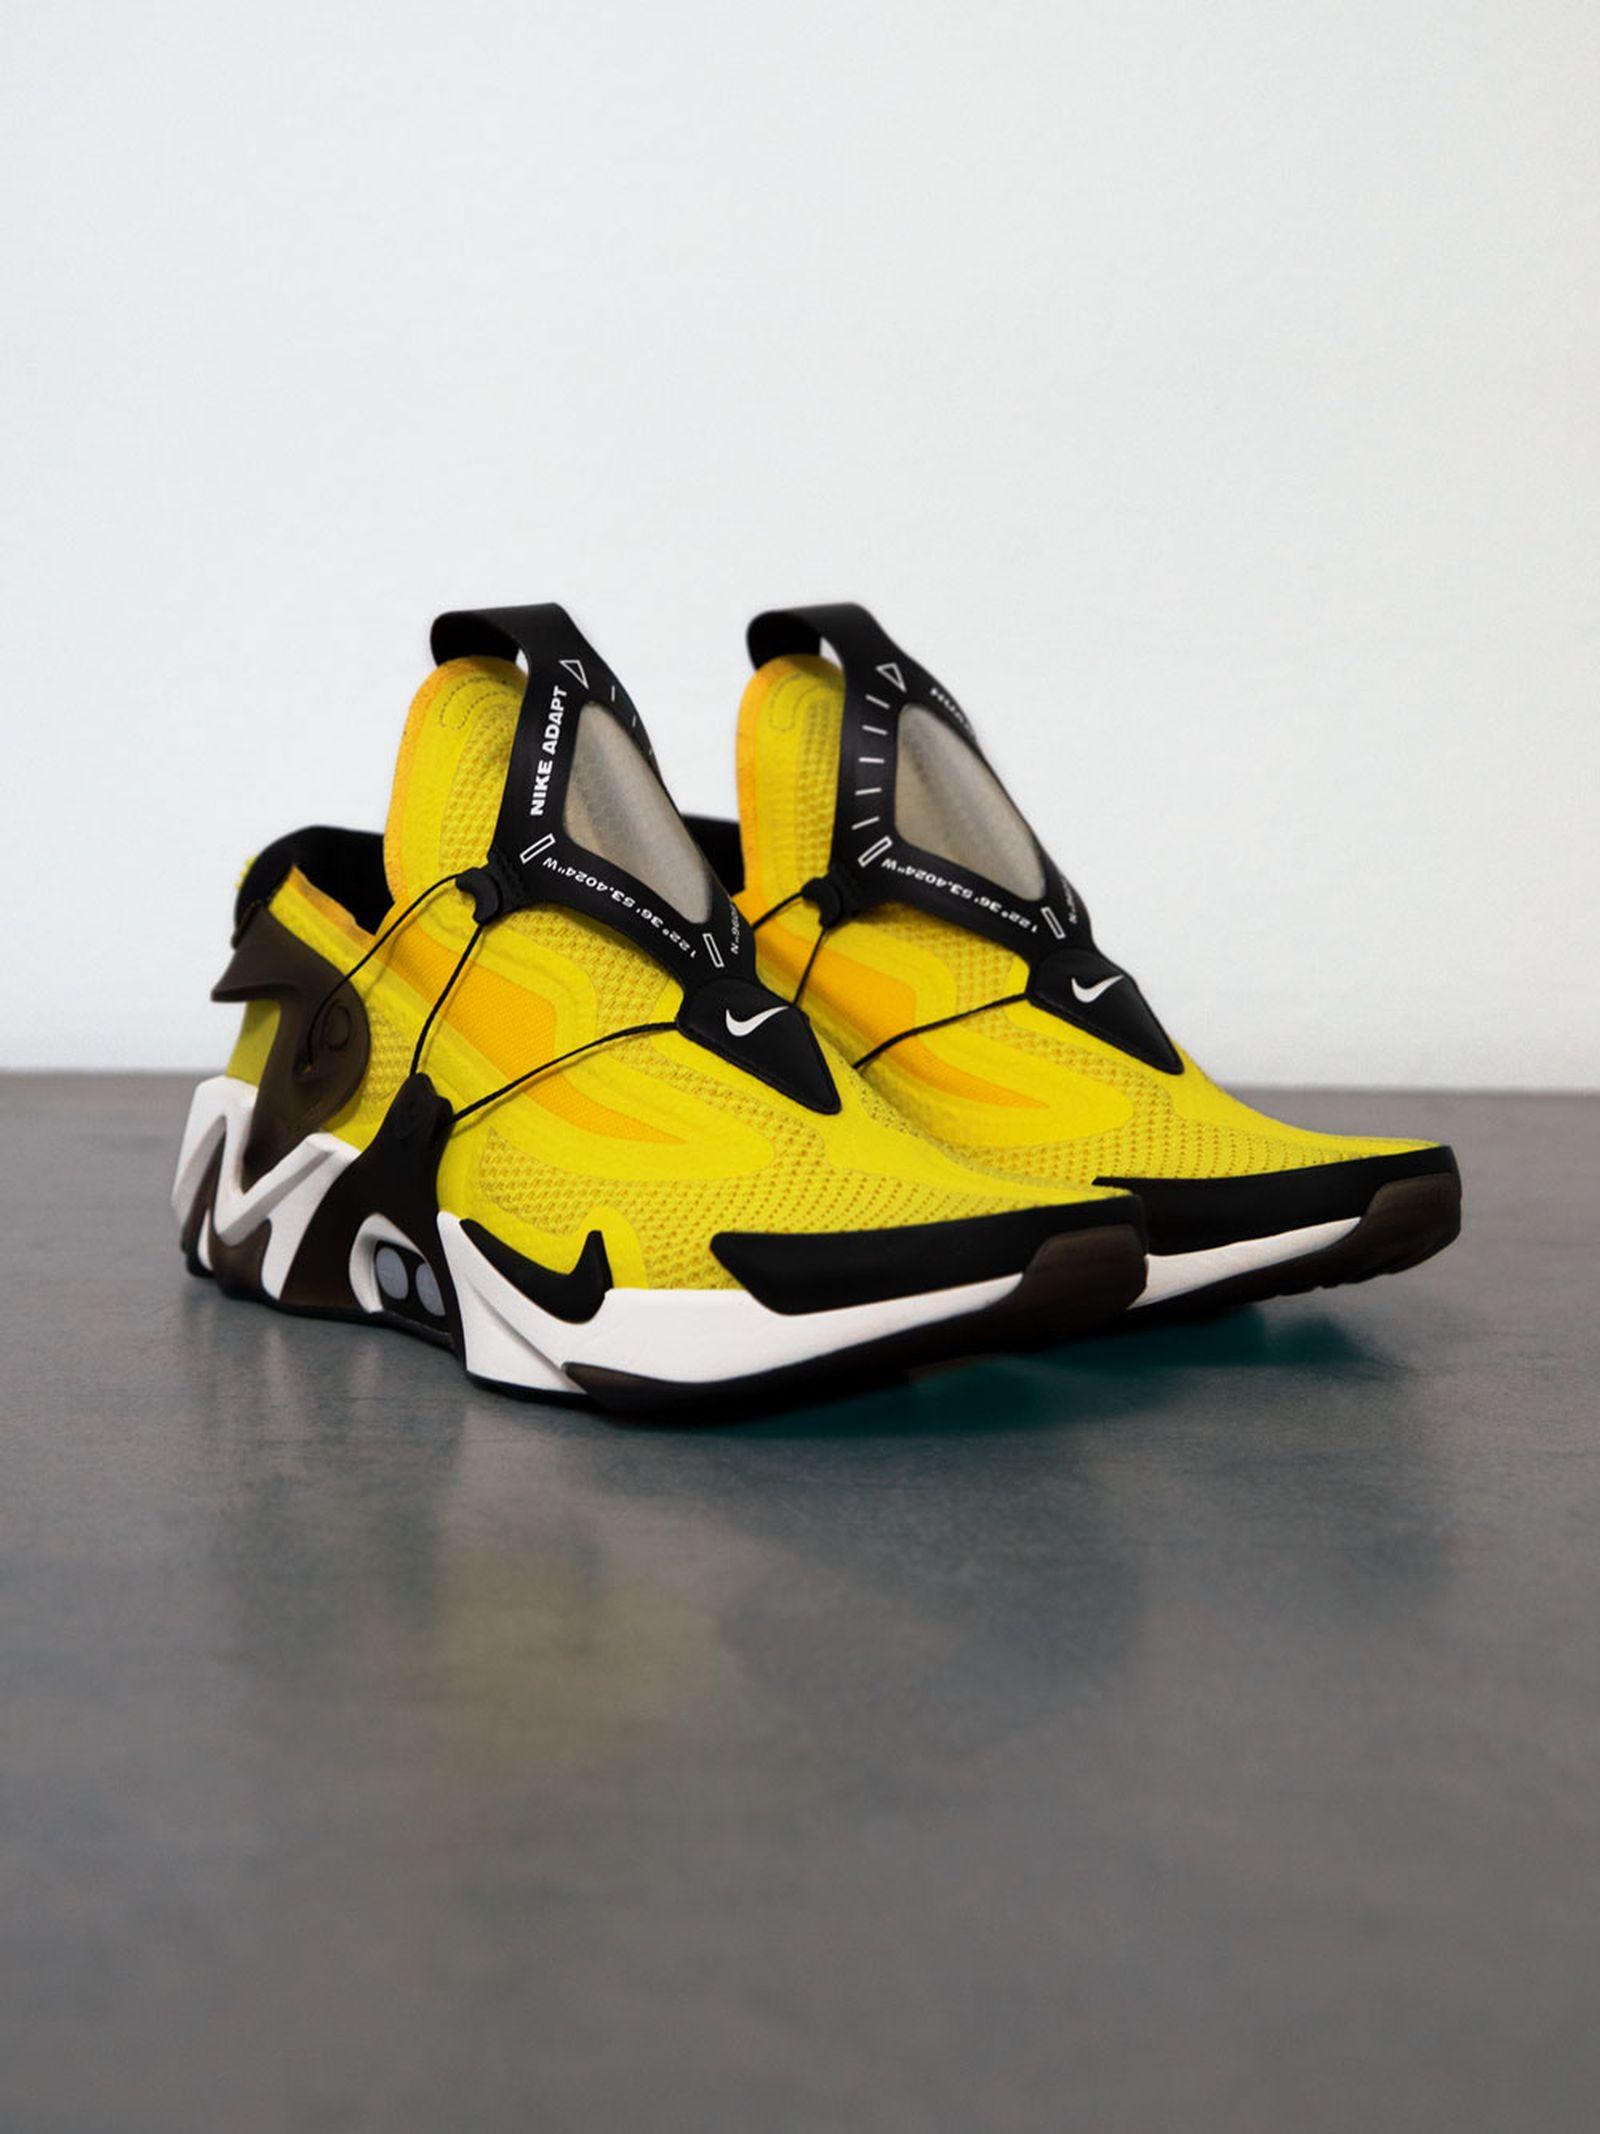 Subtropical Dinkarville Escarpado  Nike Adapt Huarache: How & Where to Buy Today